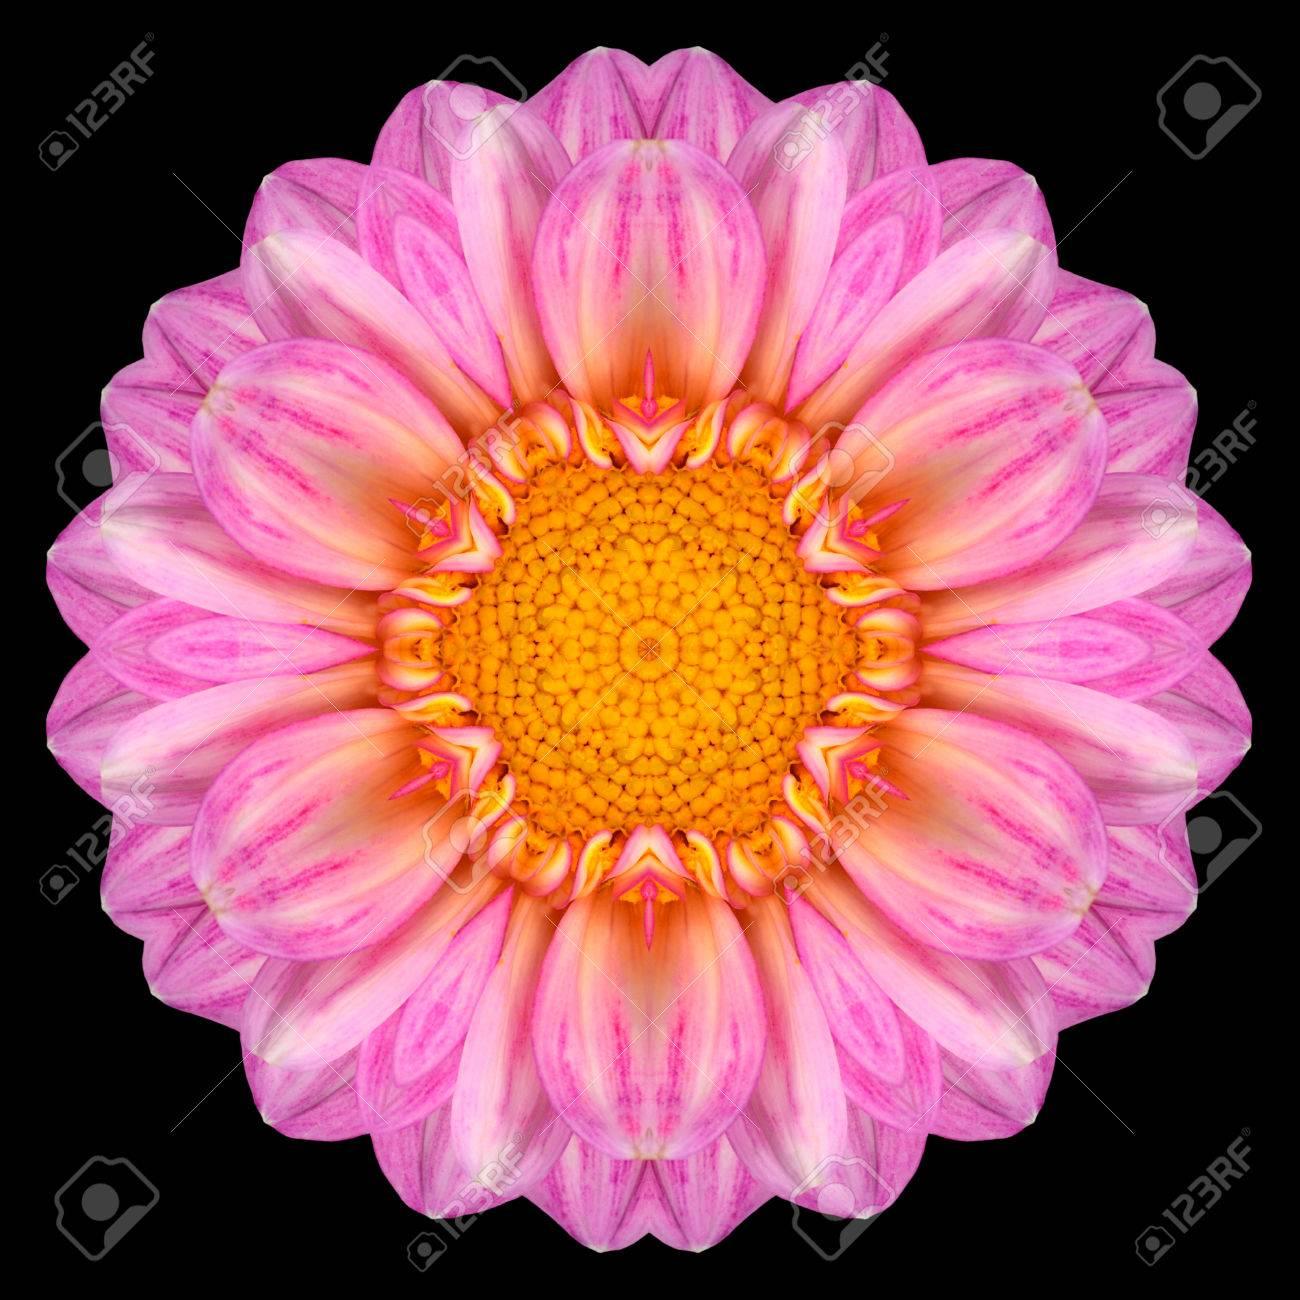 Pink Purple Mandala Of Dahlia Flower With Yellow Center